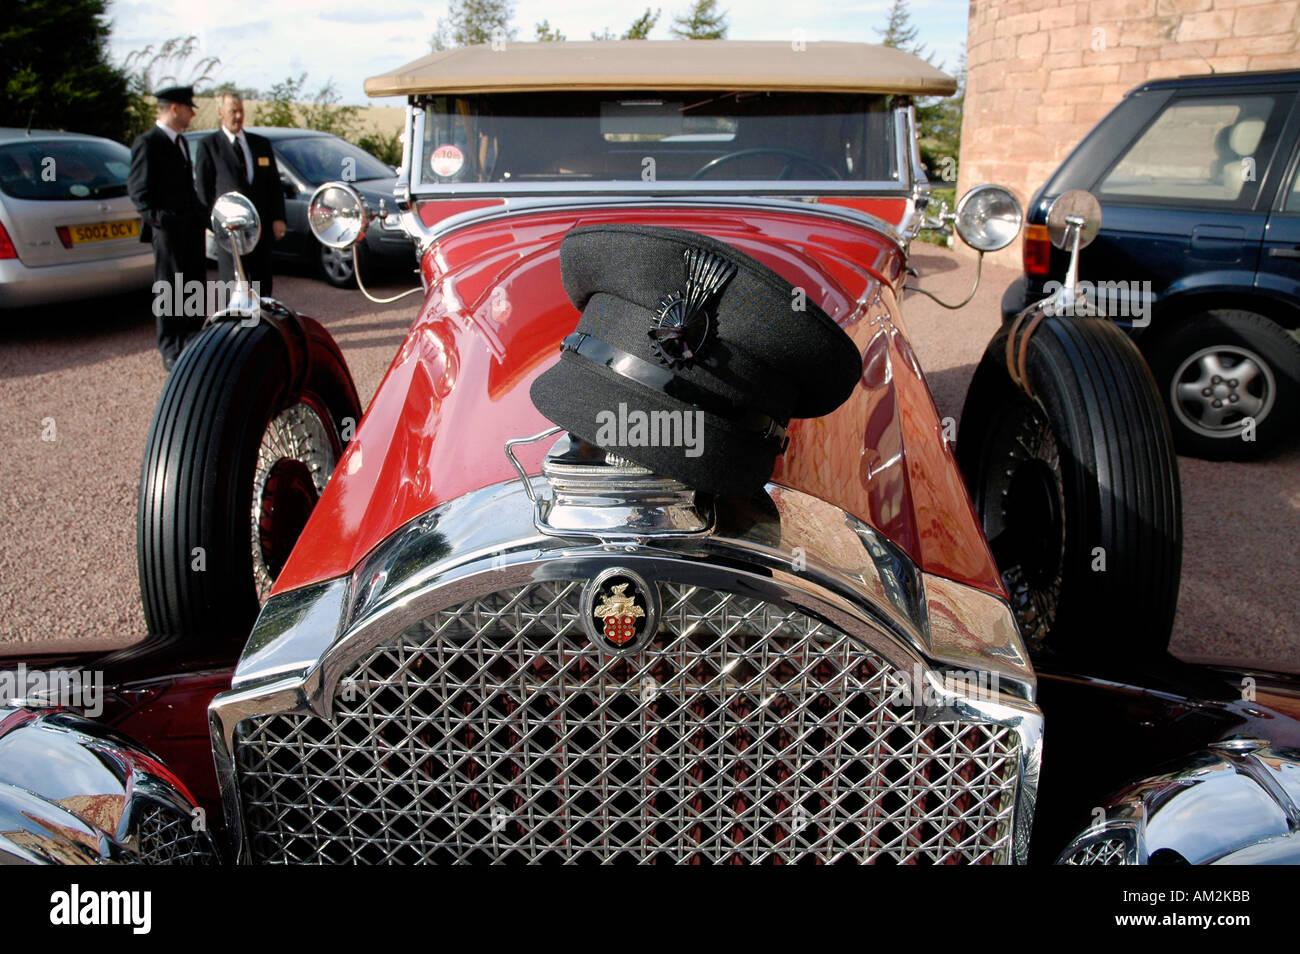 Unusual Kbb Vintage Gallery - Classic Cars Ideas - boiq.info